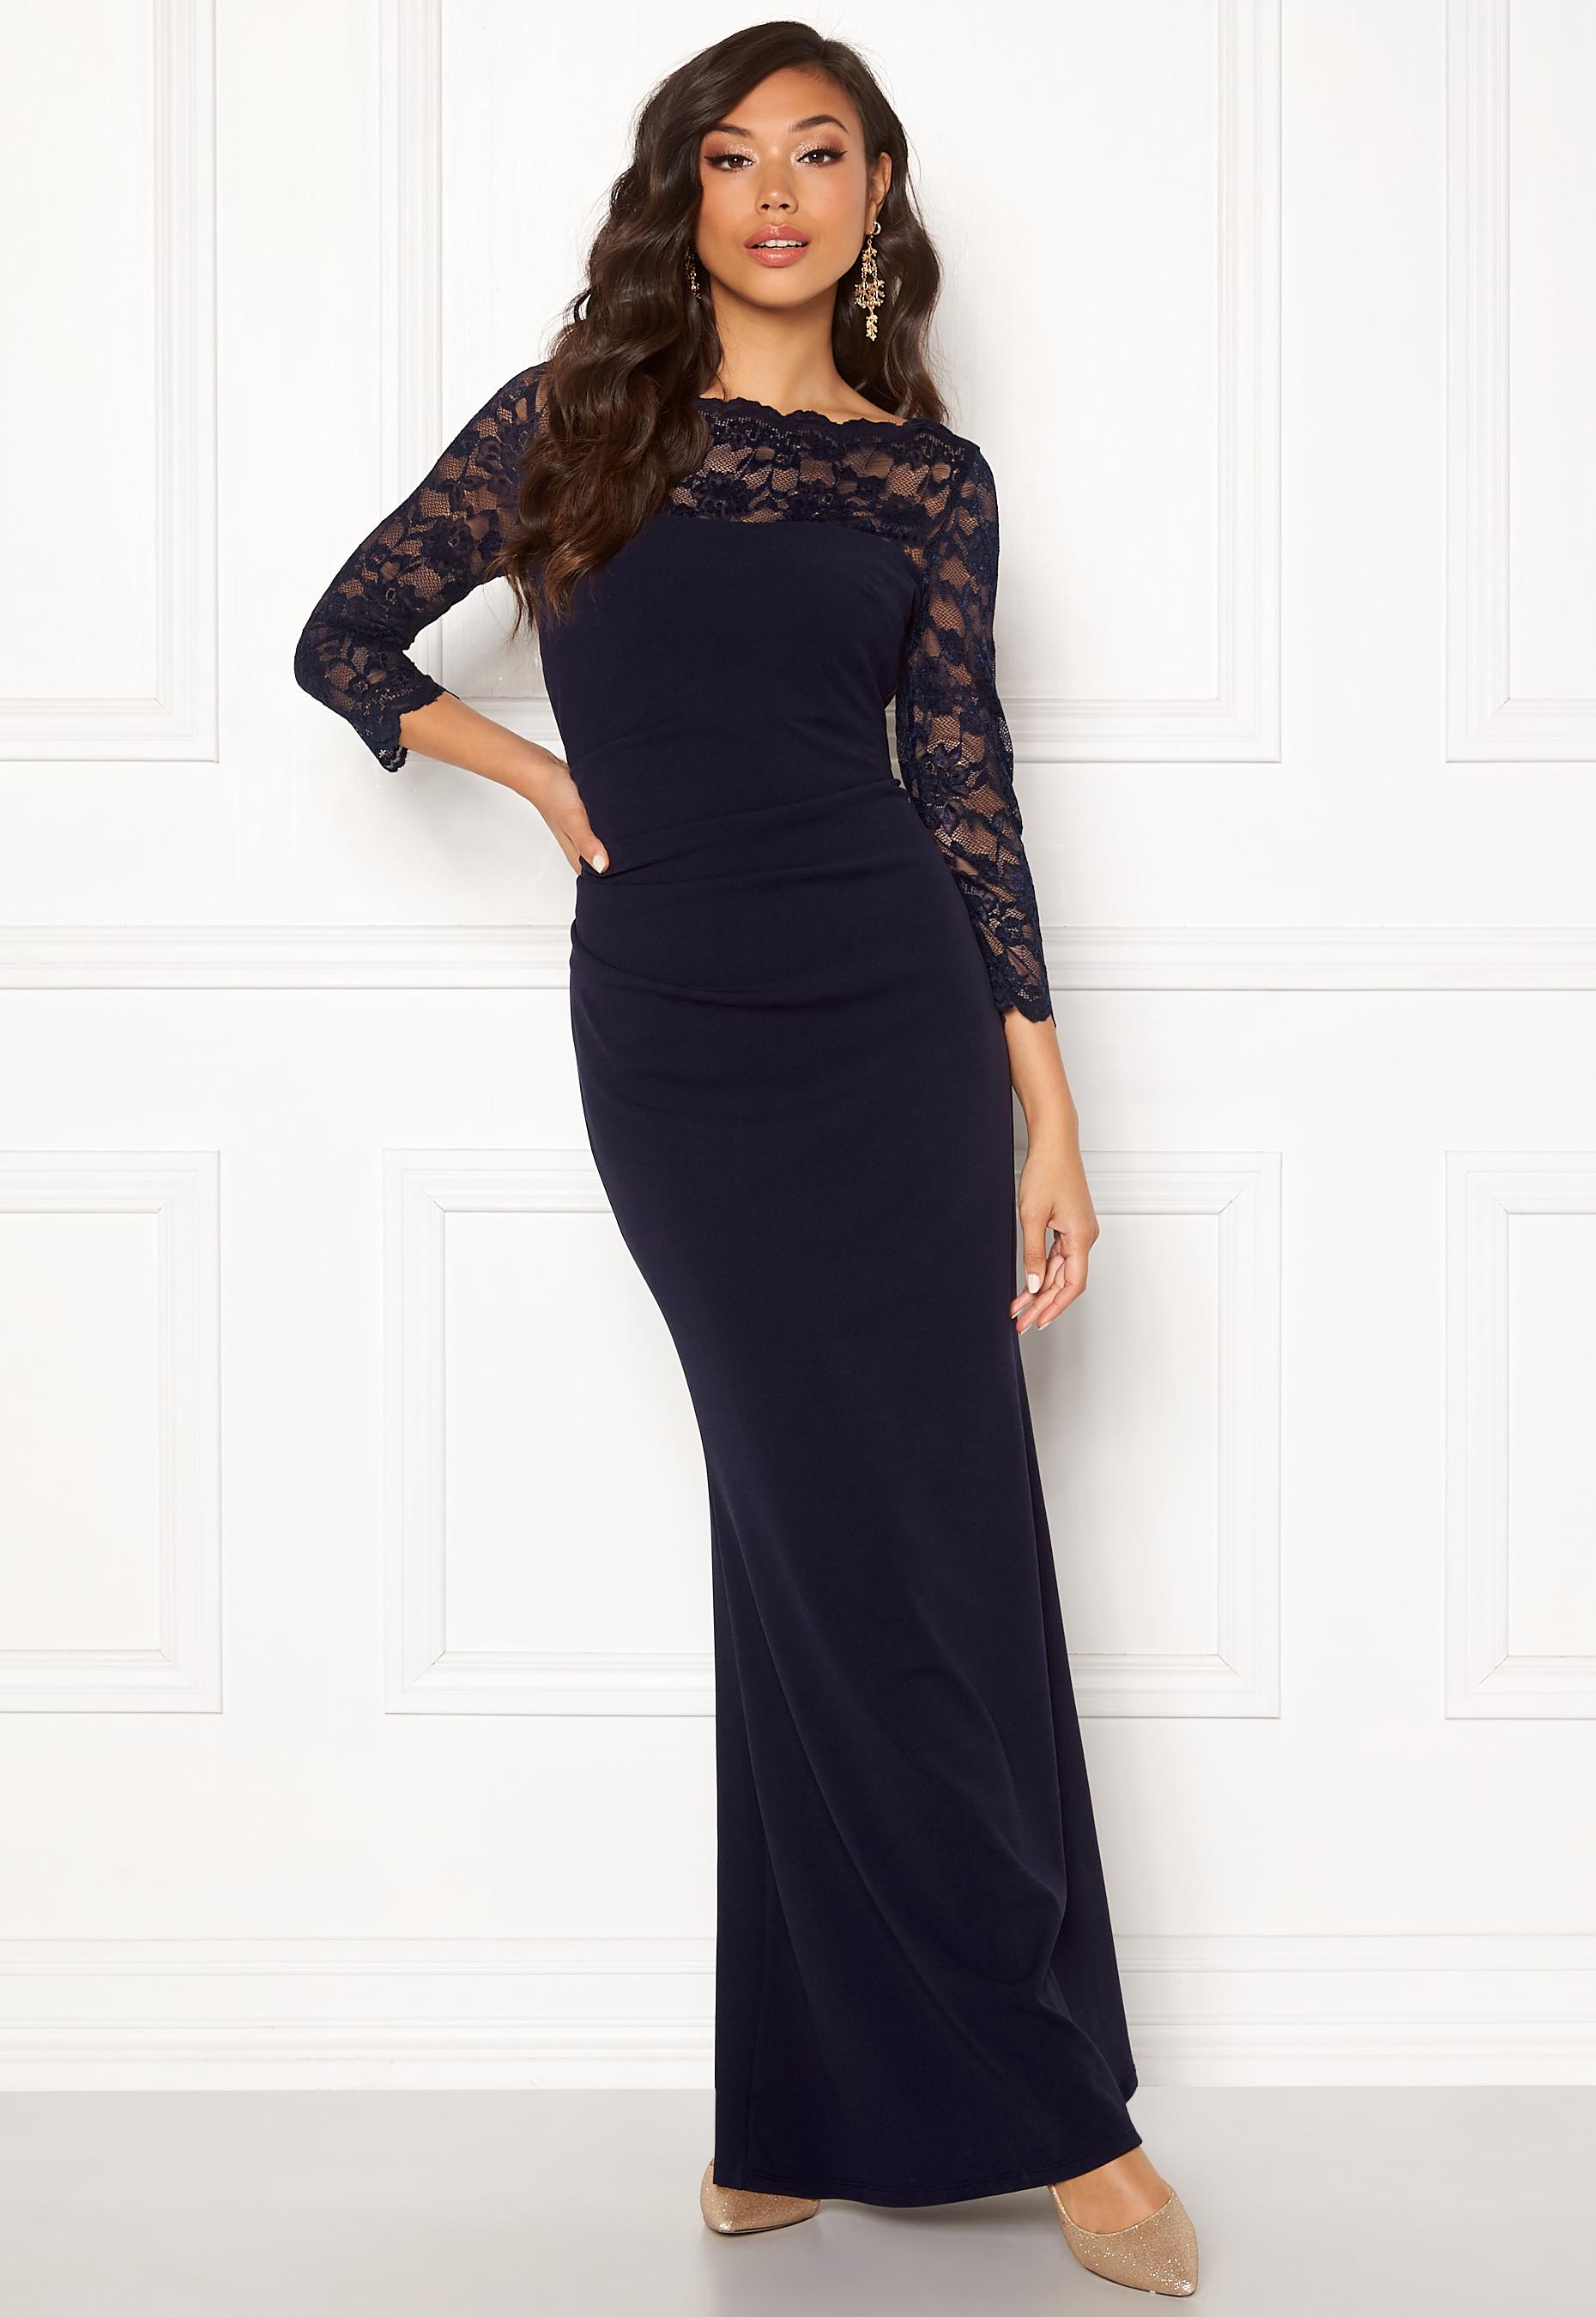 58439bf6 Goddiva 3/4 Lace Trim Maxi Dress Navy - Bubbleroom